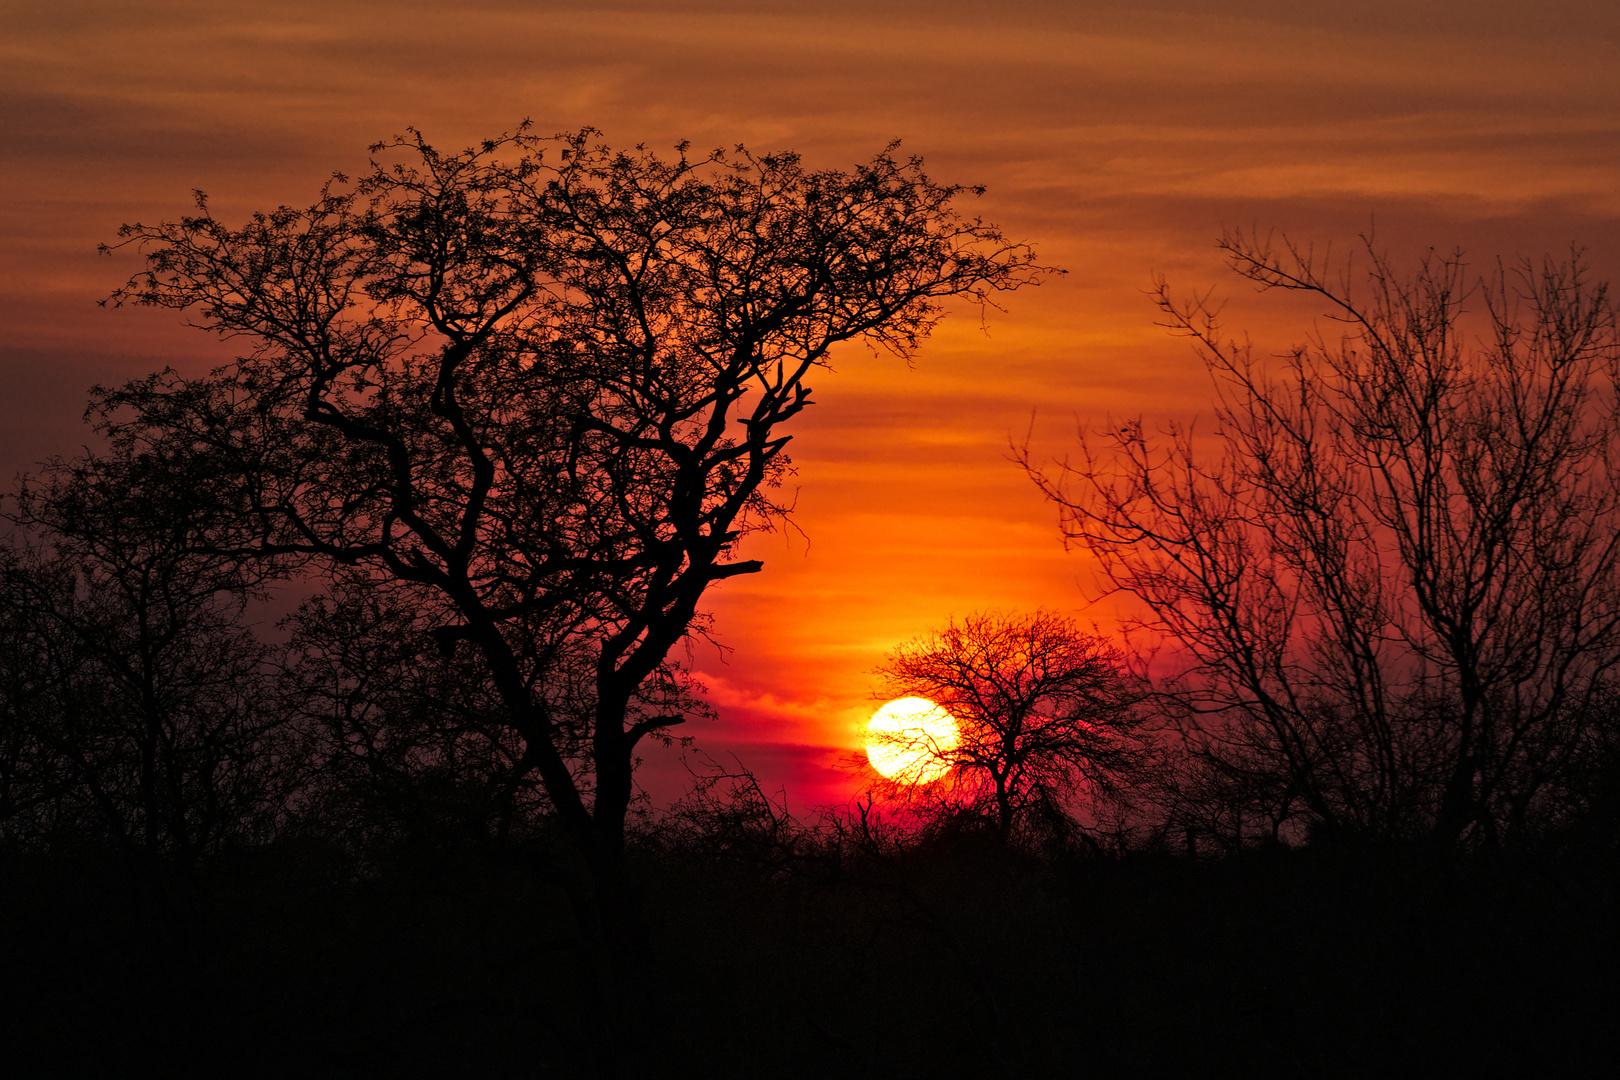 The african sun